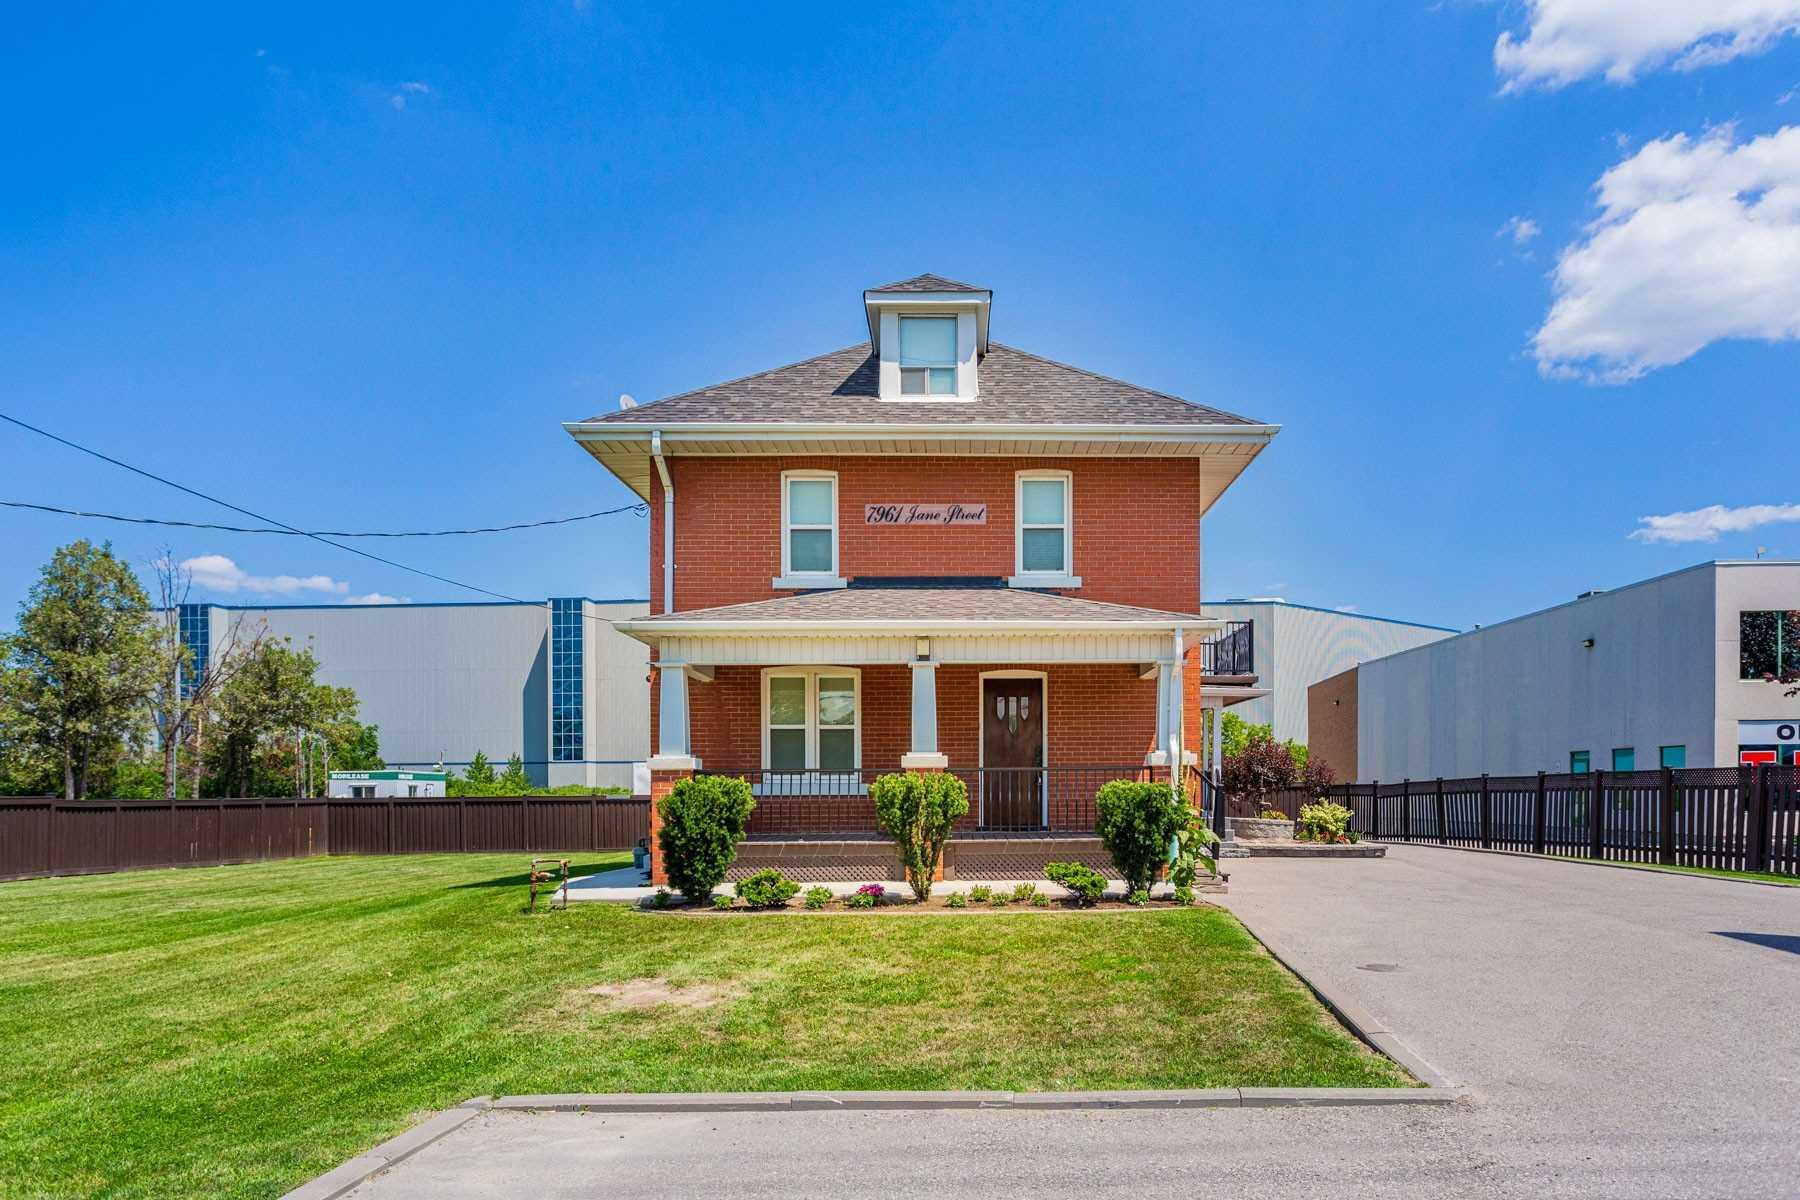 Detached house For Sale In Vaughan - 7961 Jane St, Vaughan, Ontario, Canada L4K2M7 , 4 Bedrooms Bedrooms, ,2 BathroomsBathrooms,Detached,For Sale,Jane